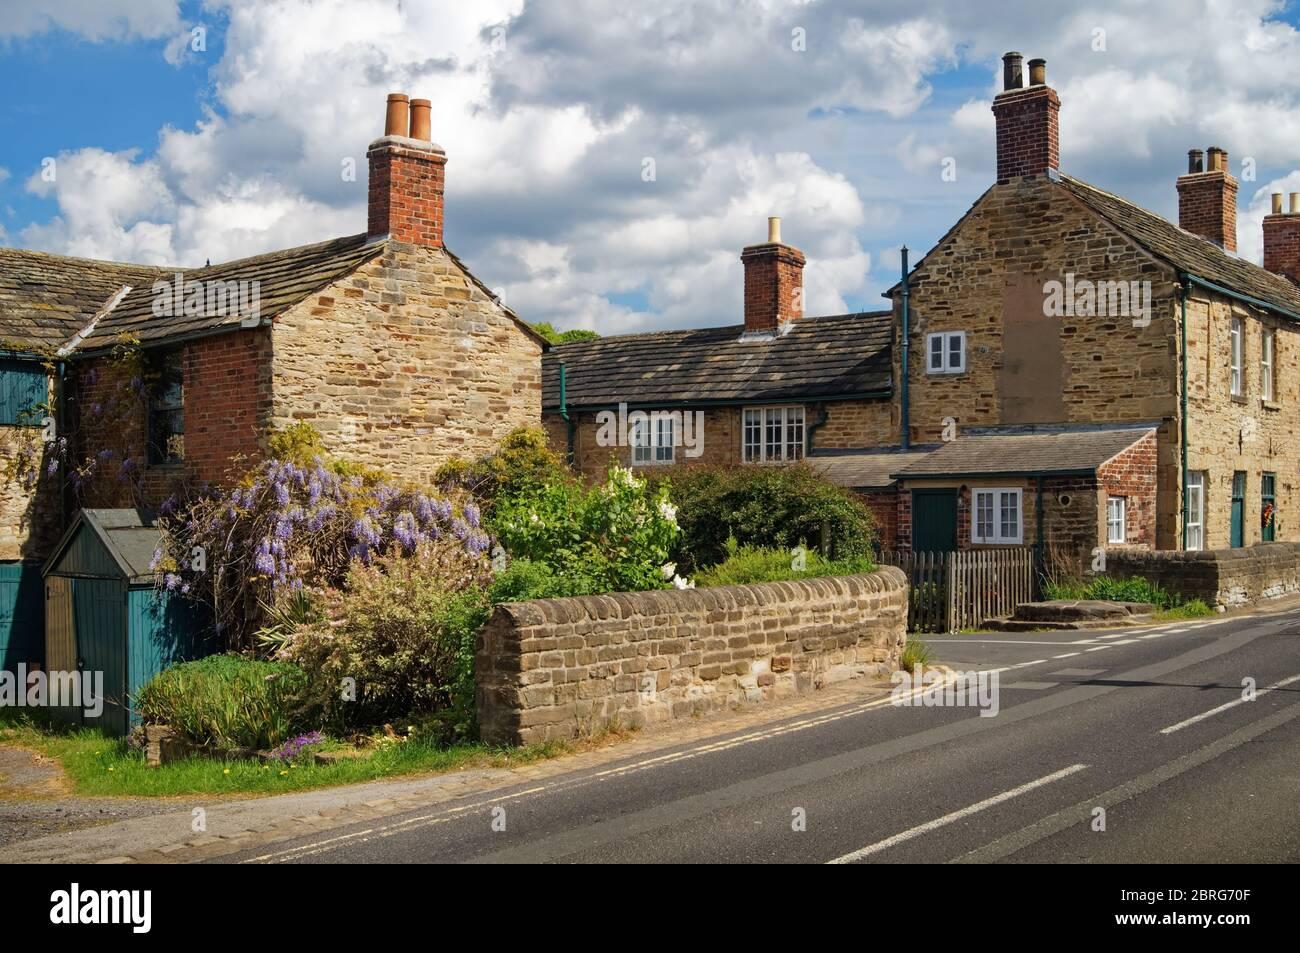 UK,South Yorkshire,Rotherham,Wentworth,Cottage next to B6090 Stock Photo